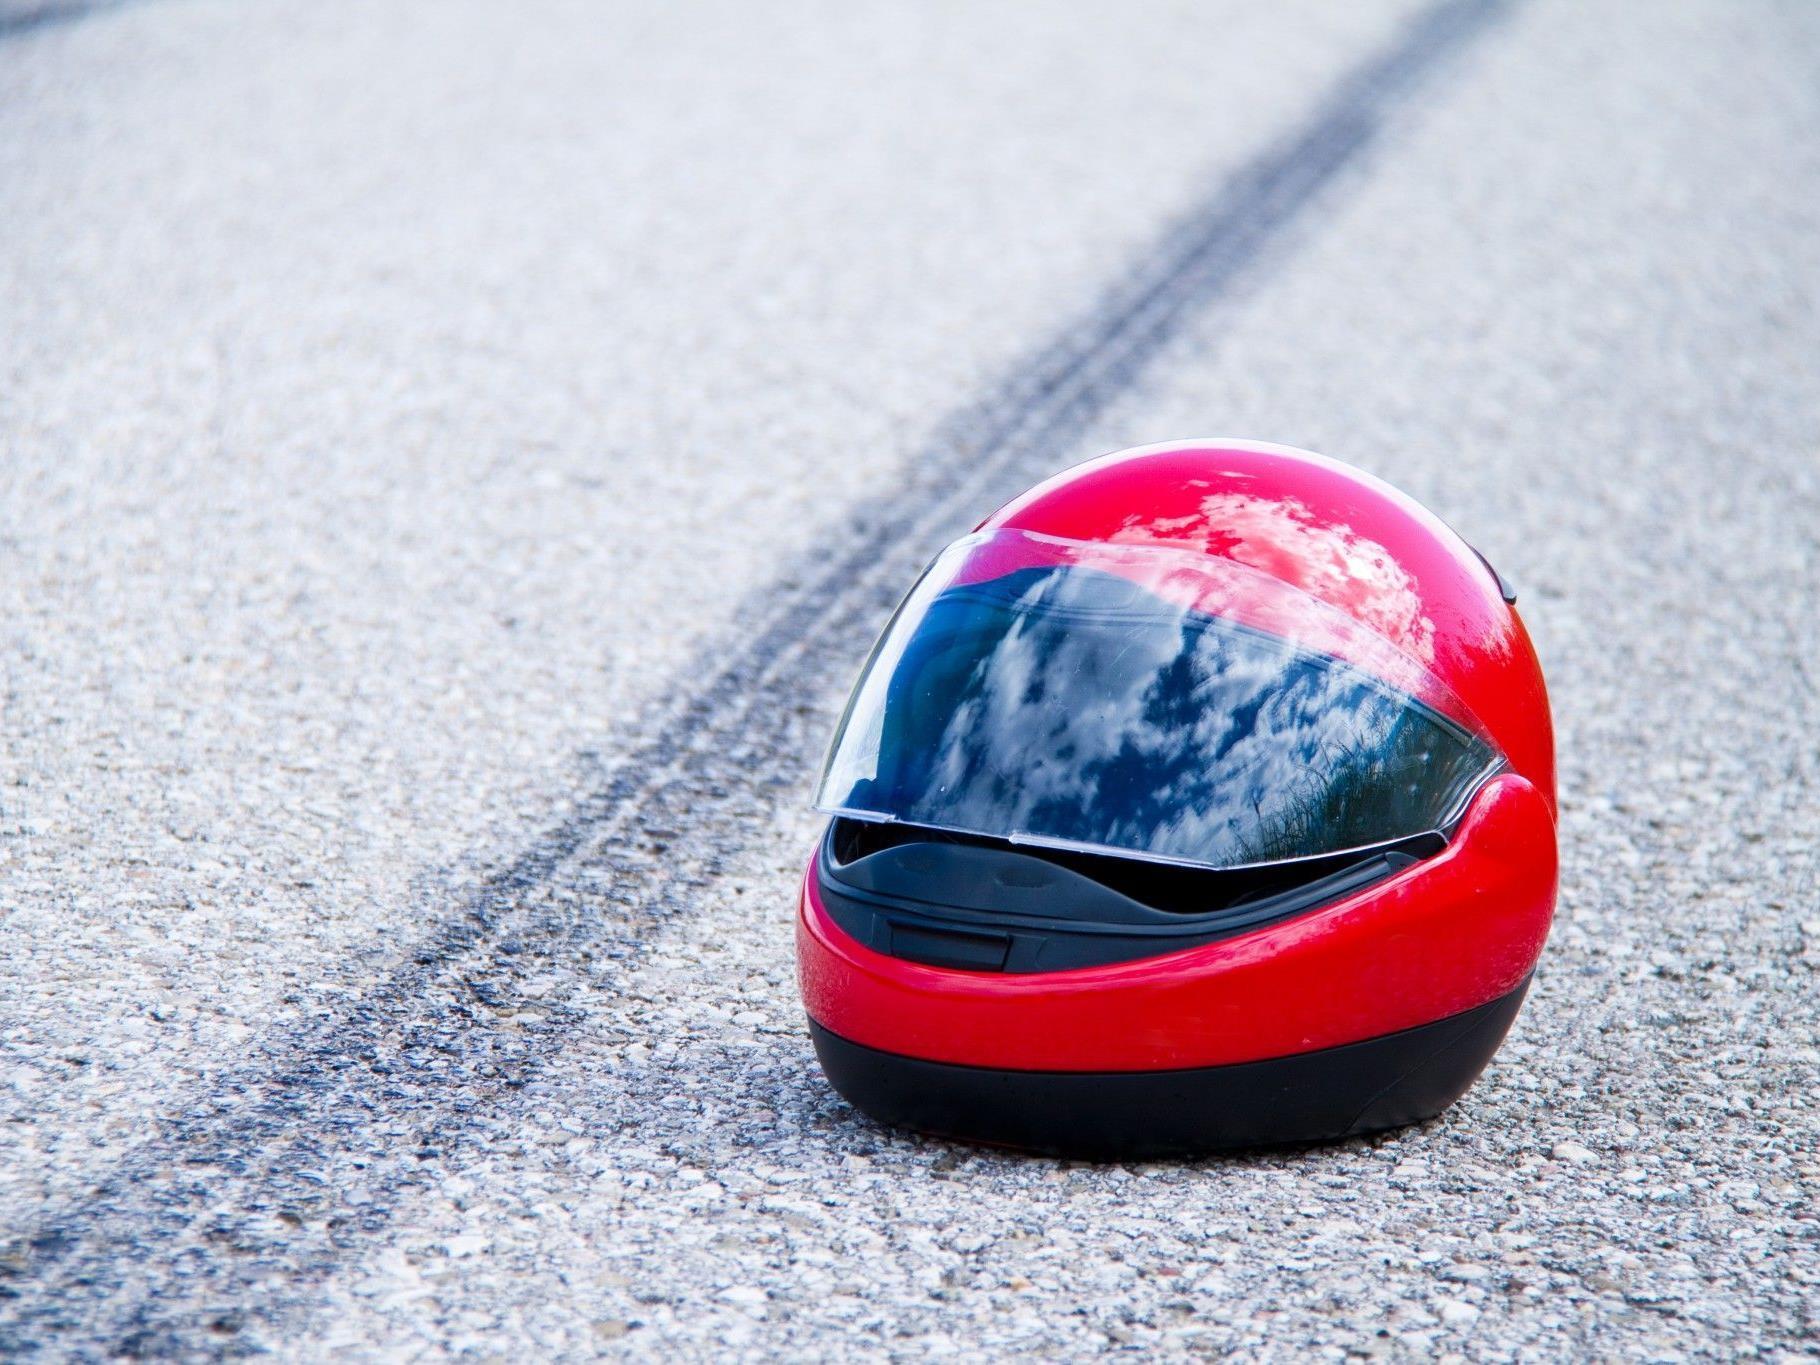 Der Biker zog sich bei dem Unfall schwere Verletzungen zu.